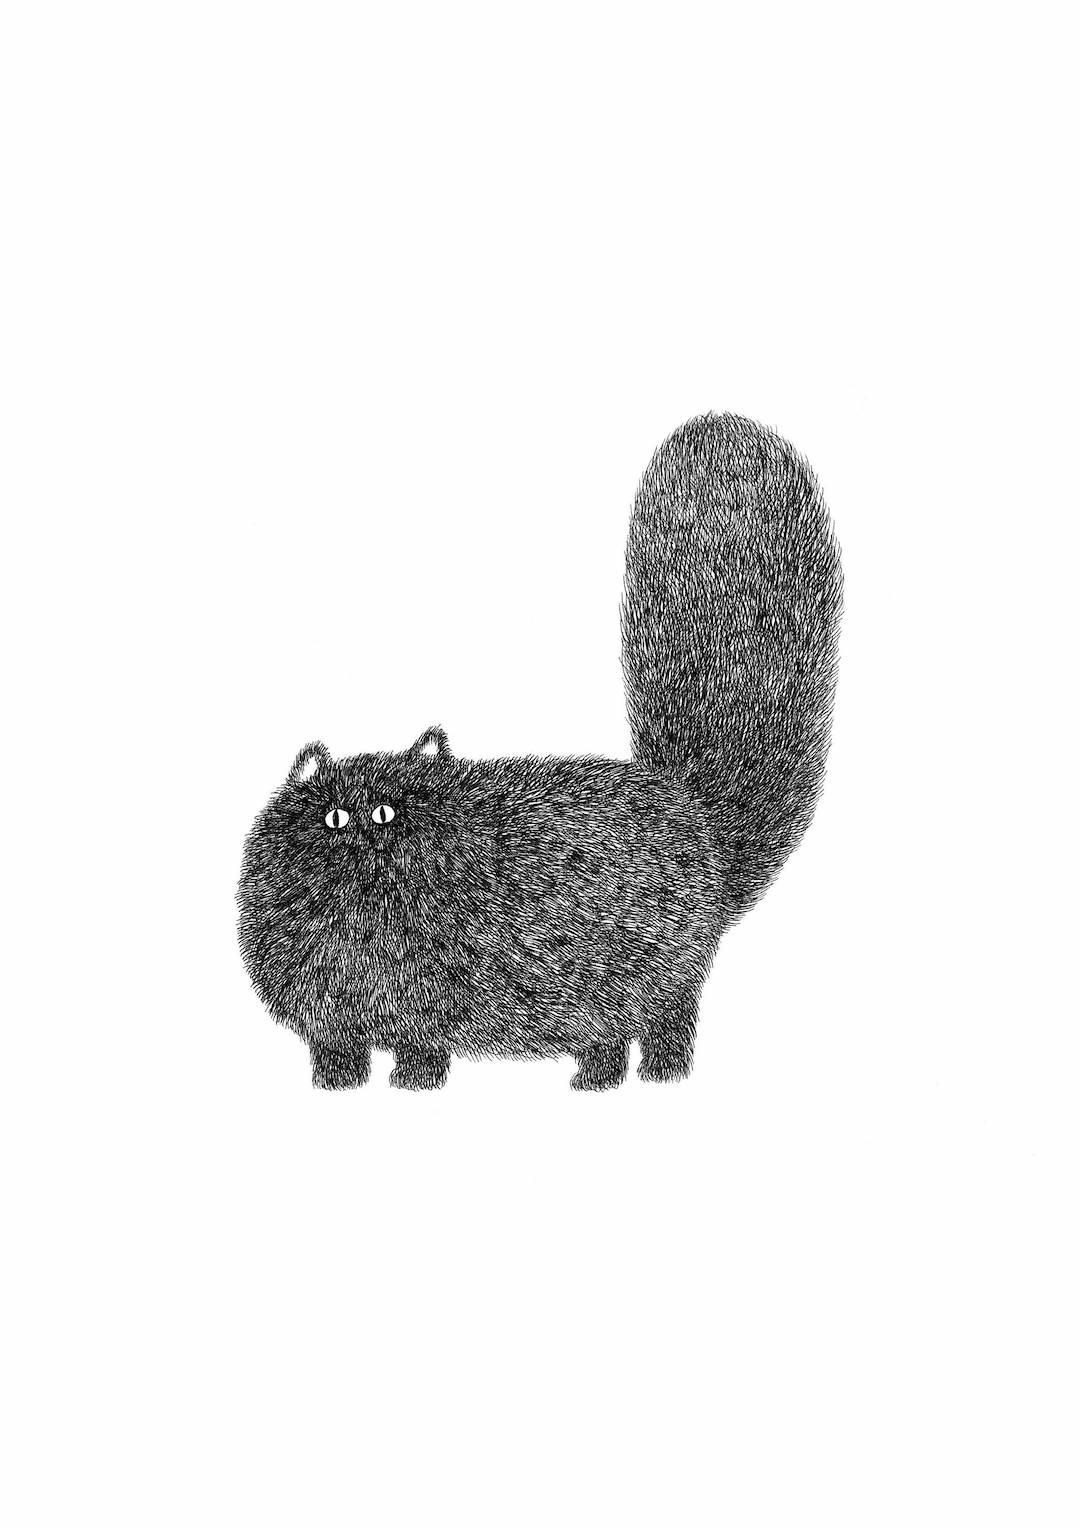 Fluffy cat art by Kamwei Fong